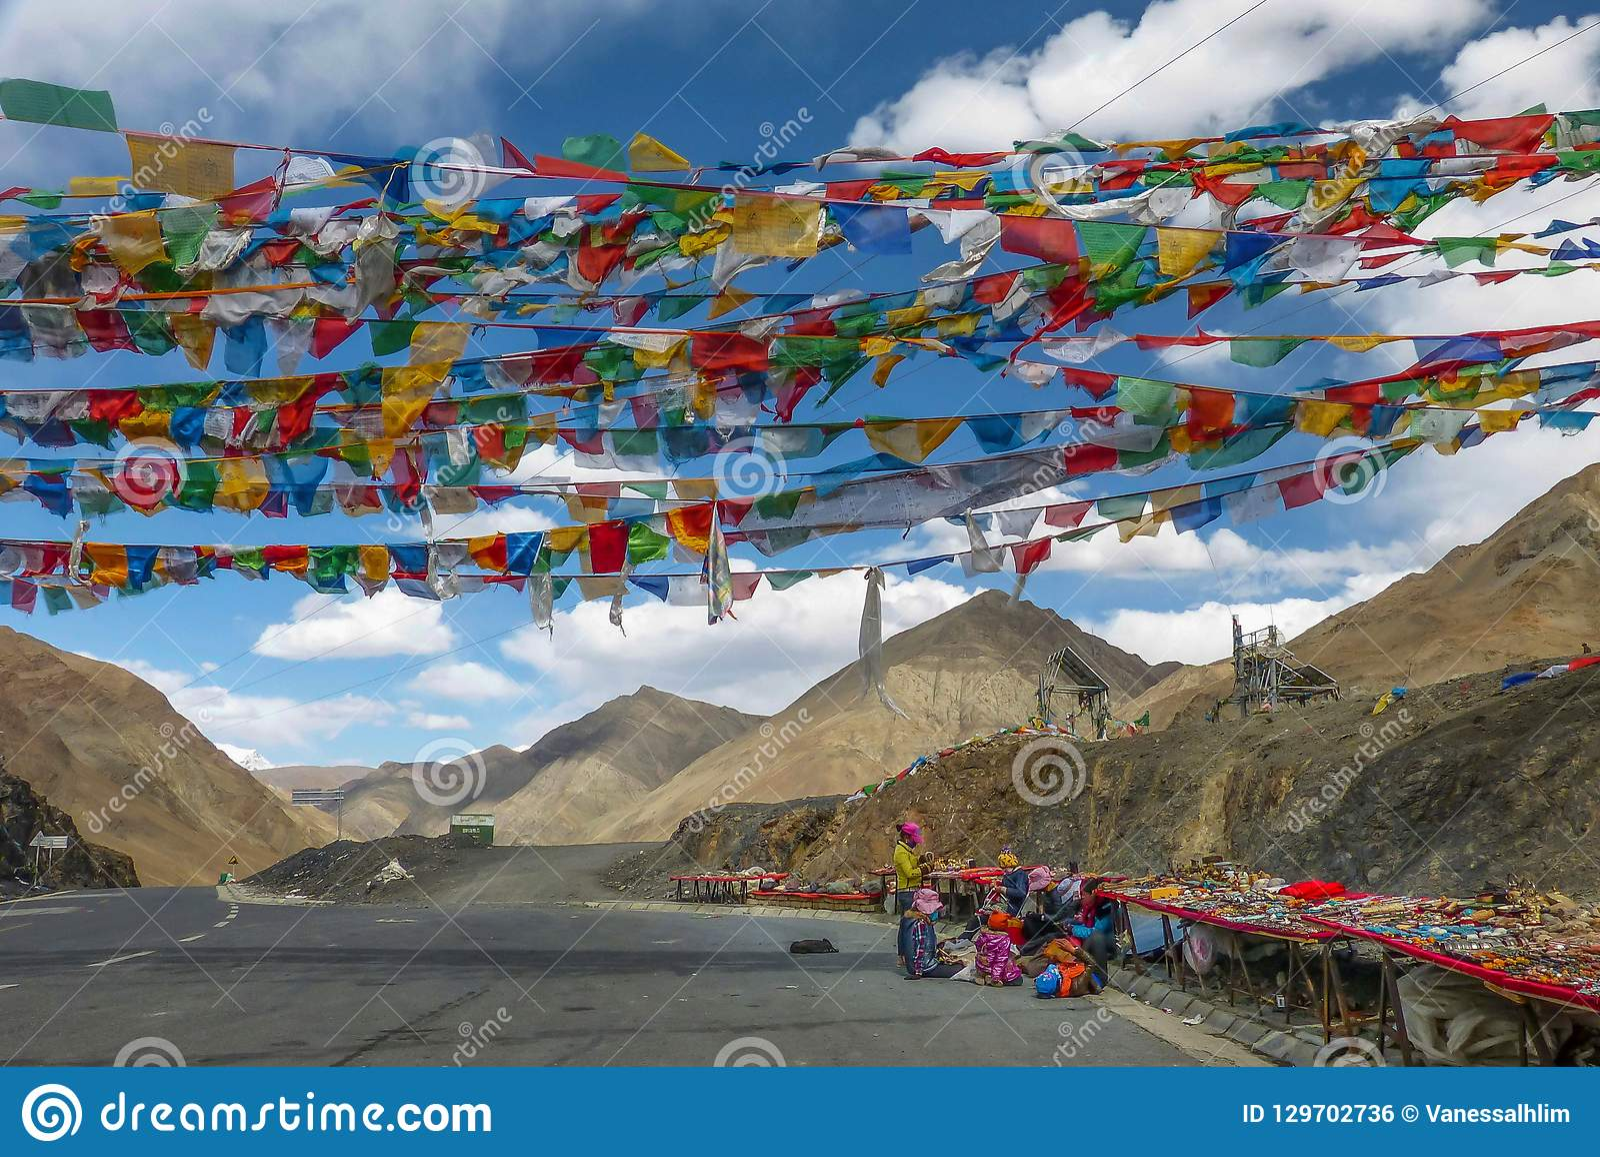 Vendor selling Tibetan stones, beads and souvenirs along the Kampala Pass in Tibet Autonomous Region